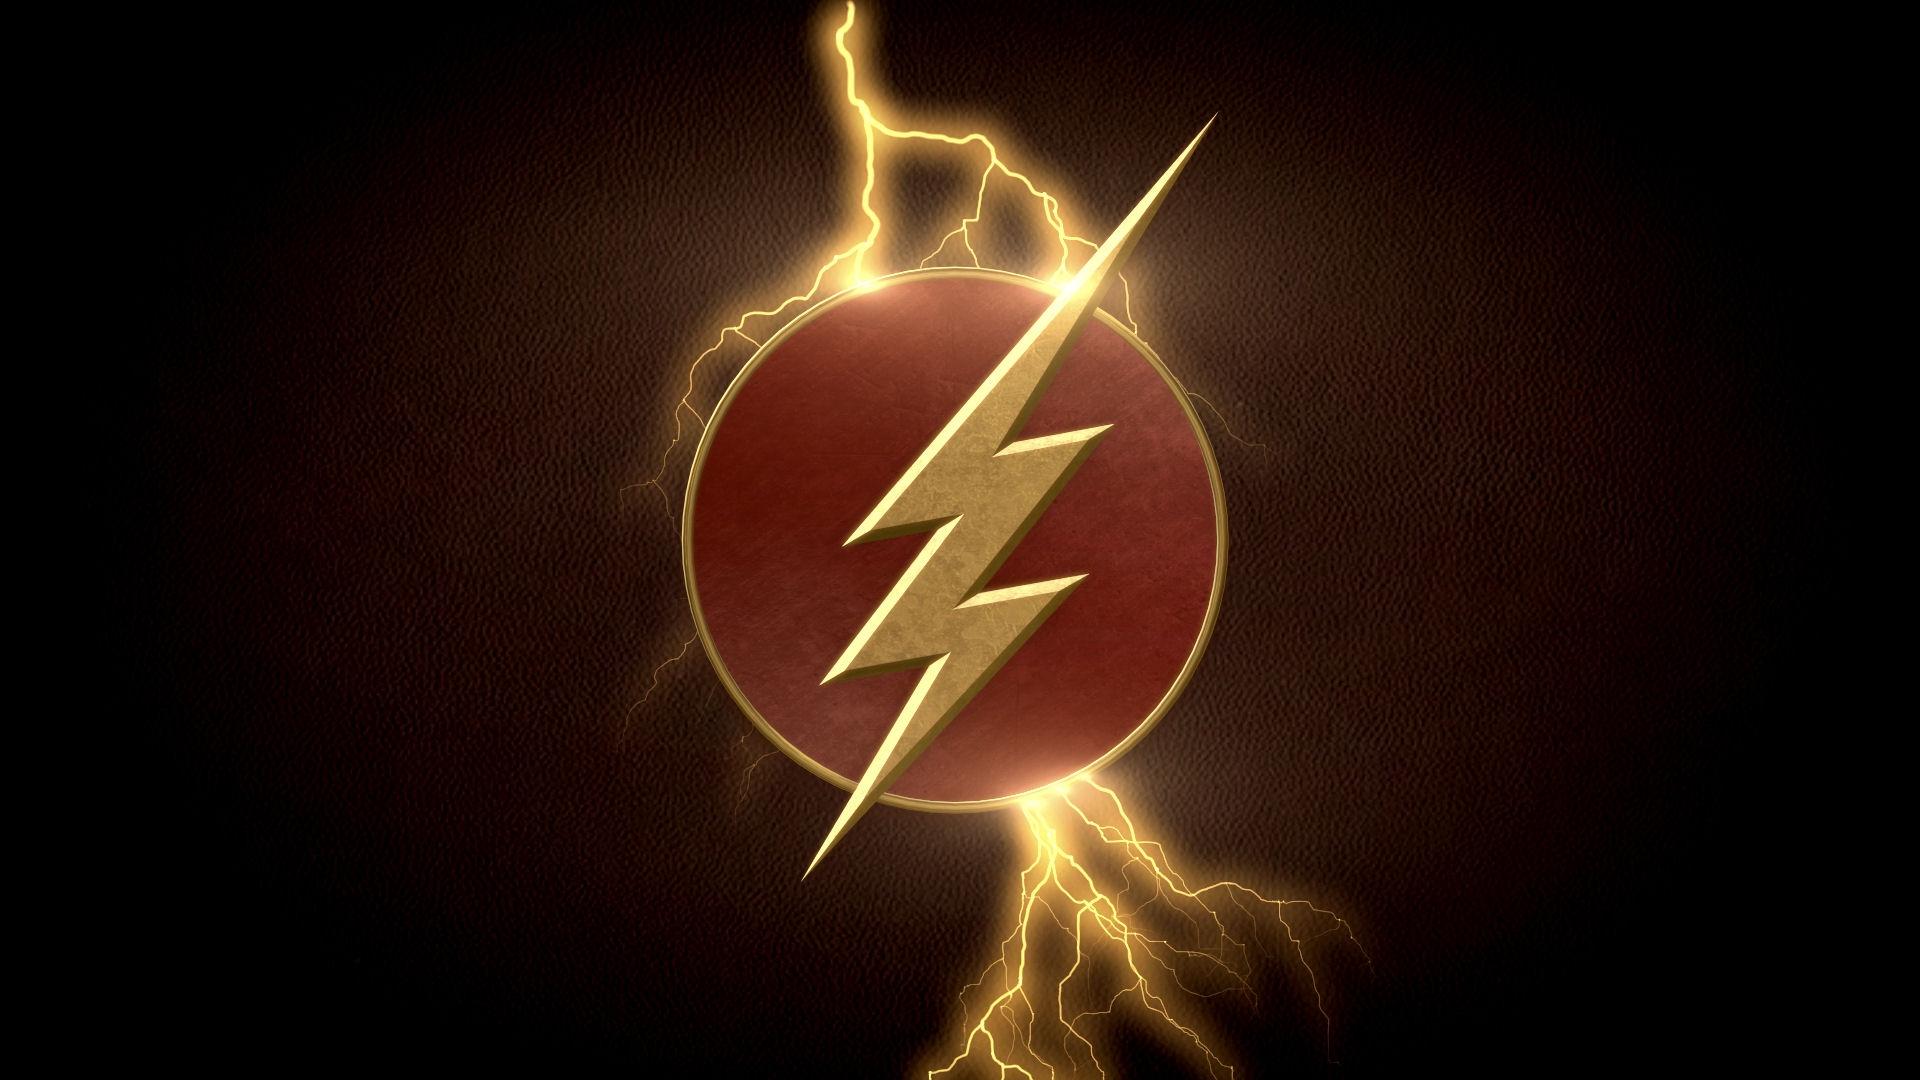 The Flash TV Series Logo HD Wallpaper 1920x1080